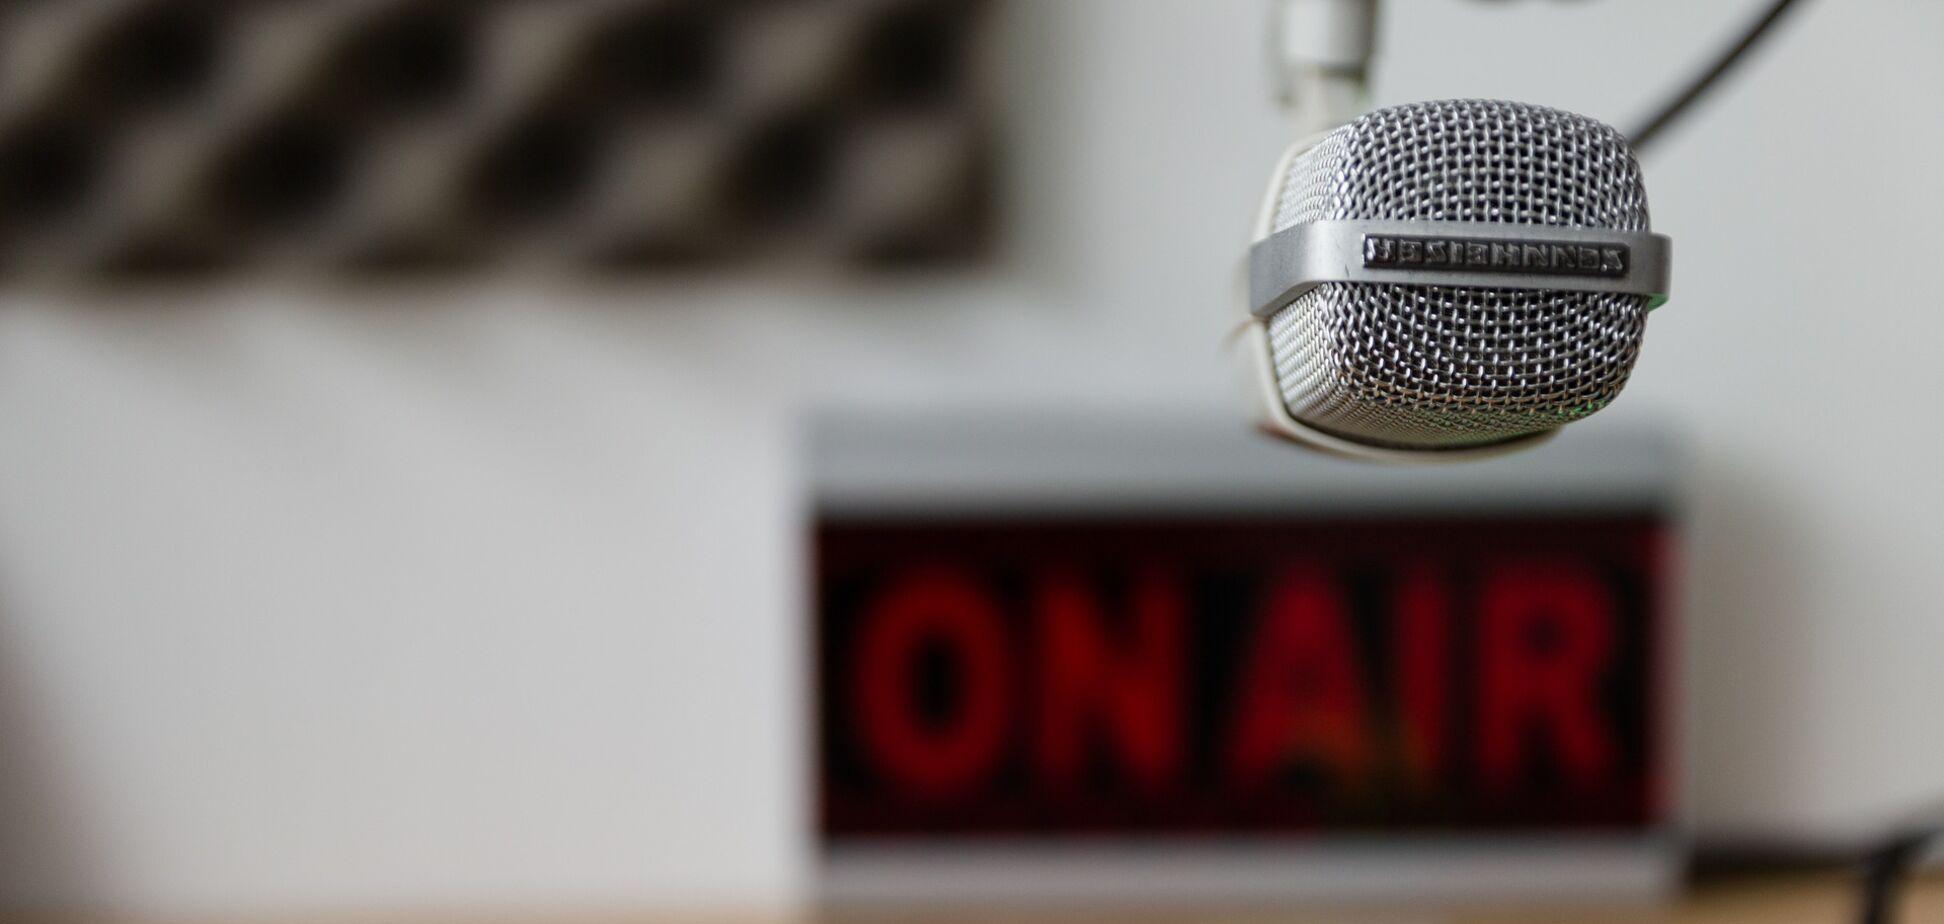 Нацрада оштрафувала українські радіостанції майже на 2 мільйони: причина